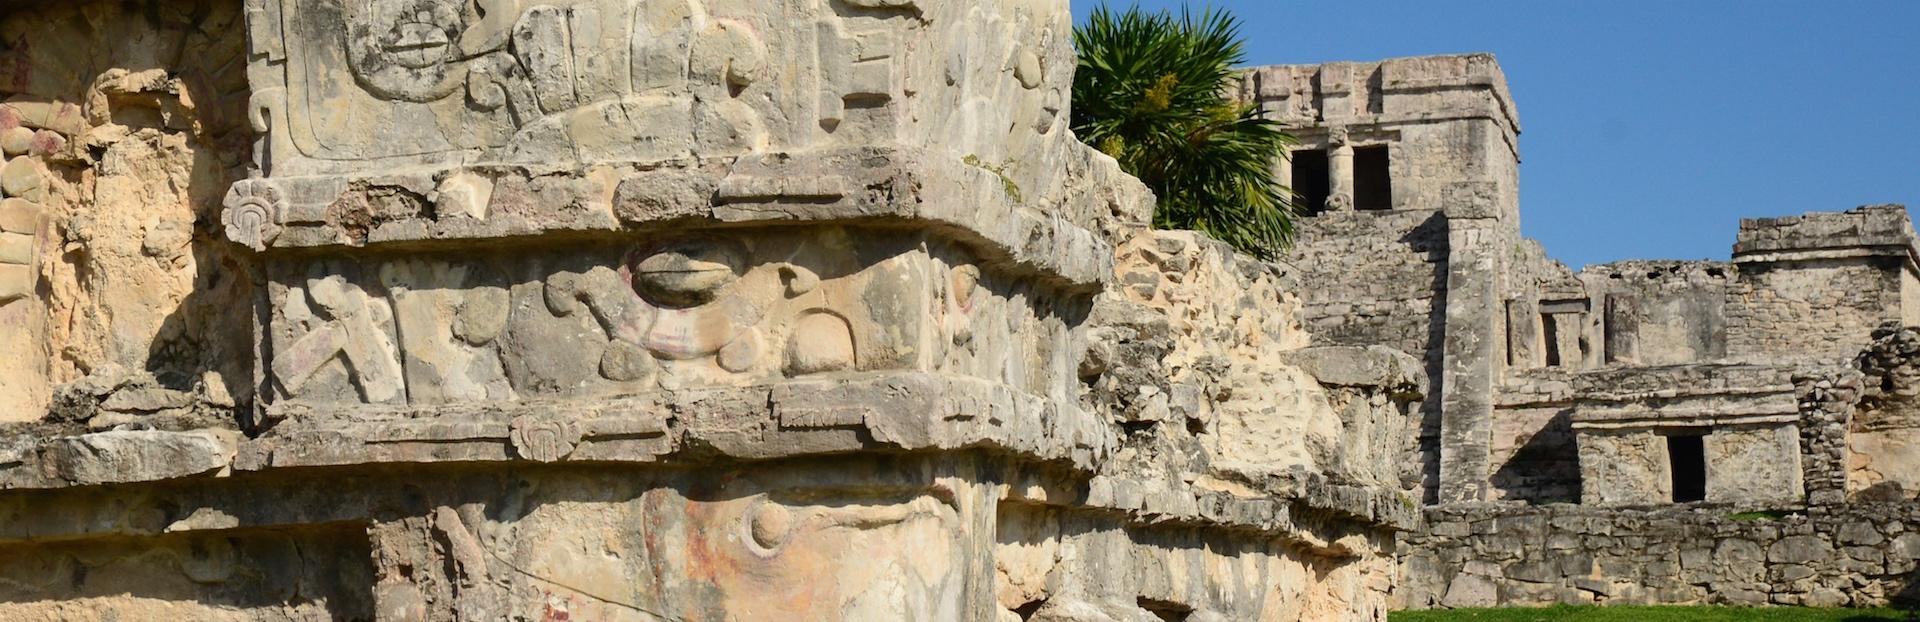 Yucatán Peninsula audio tour: Tulum: The Rise of the Descending God